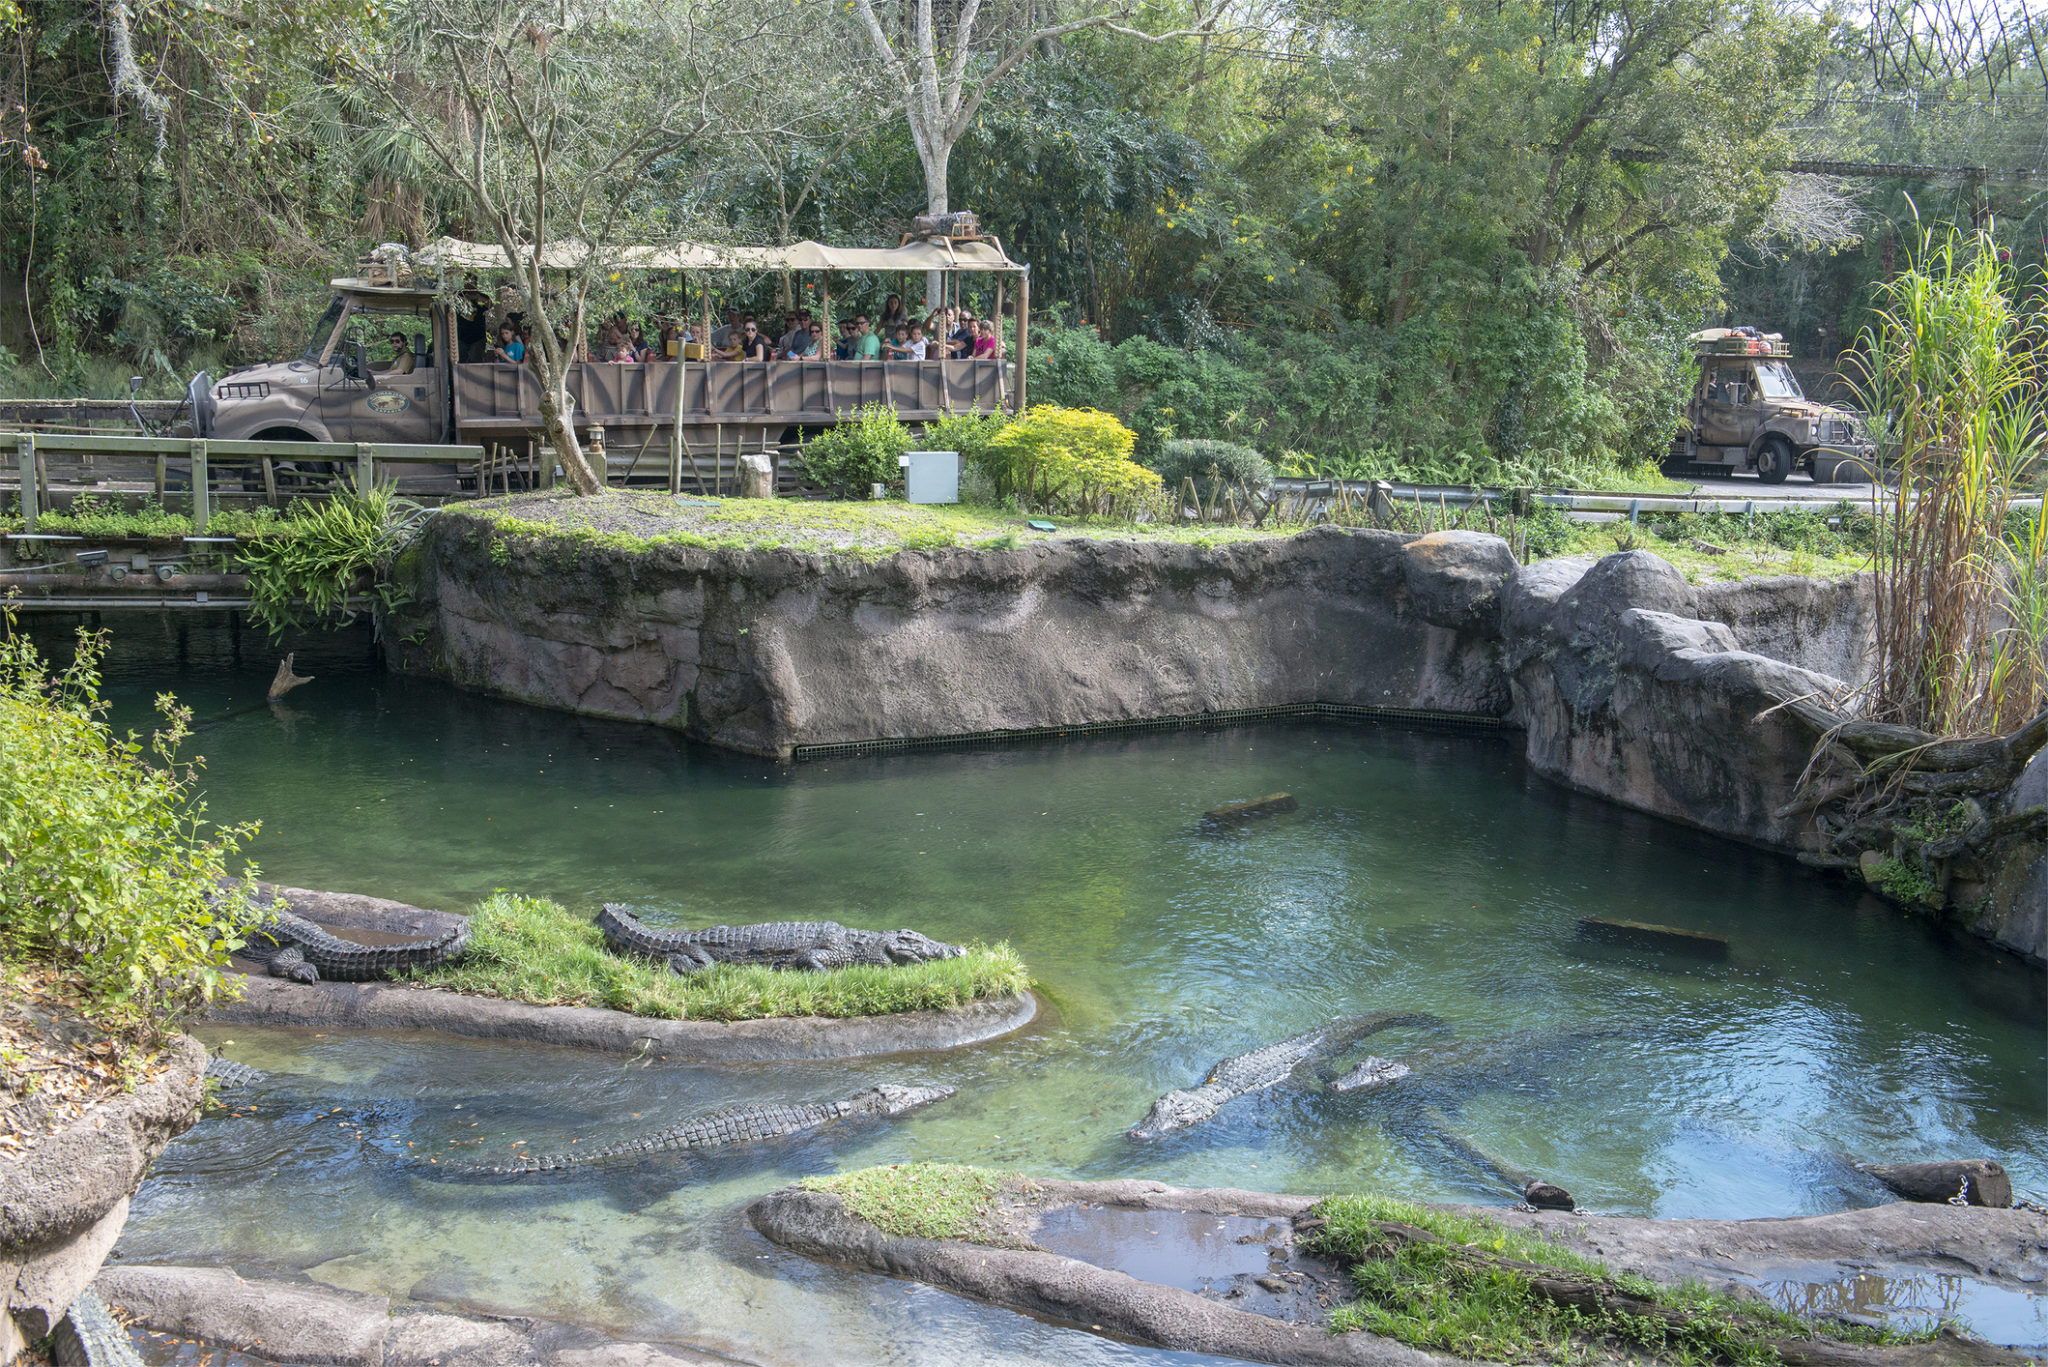 kilimanjaro safari ride at animal kingdom